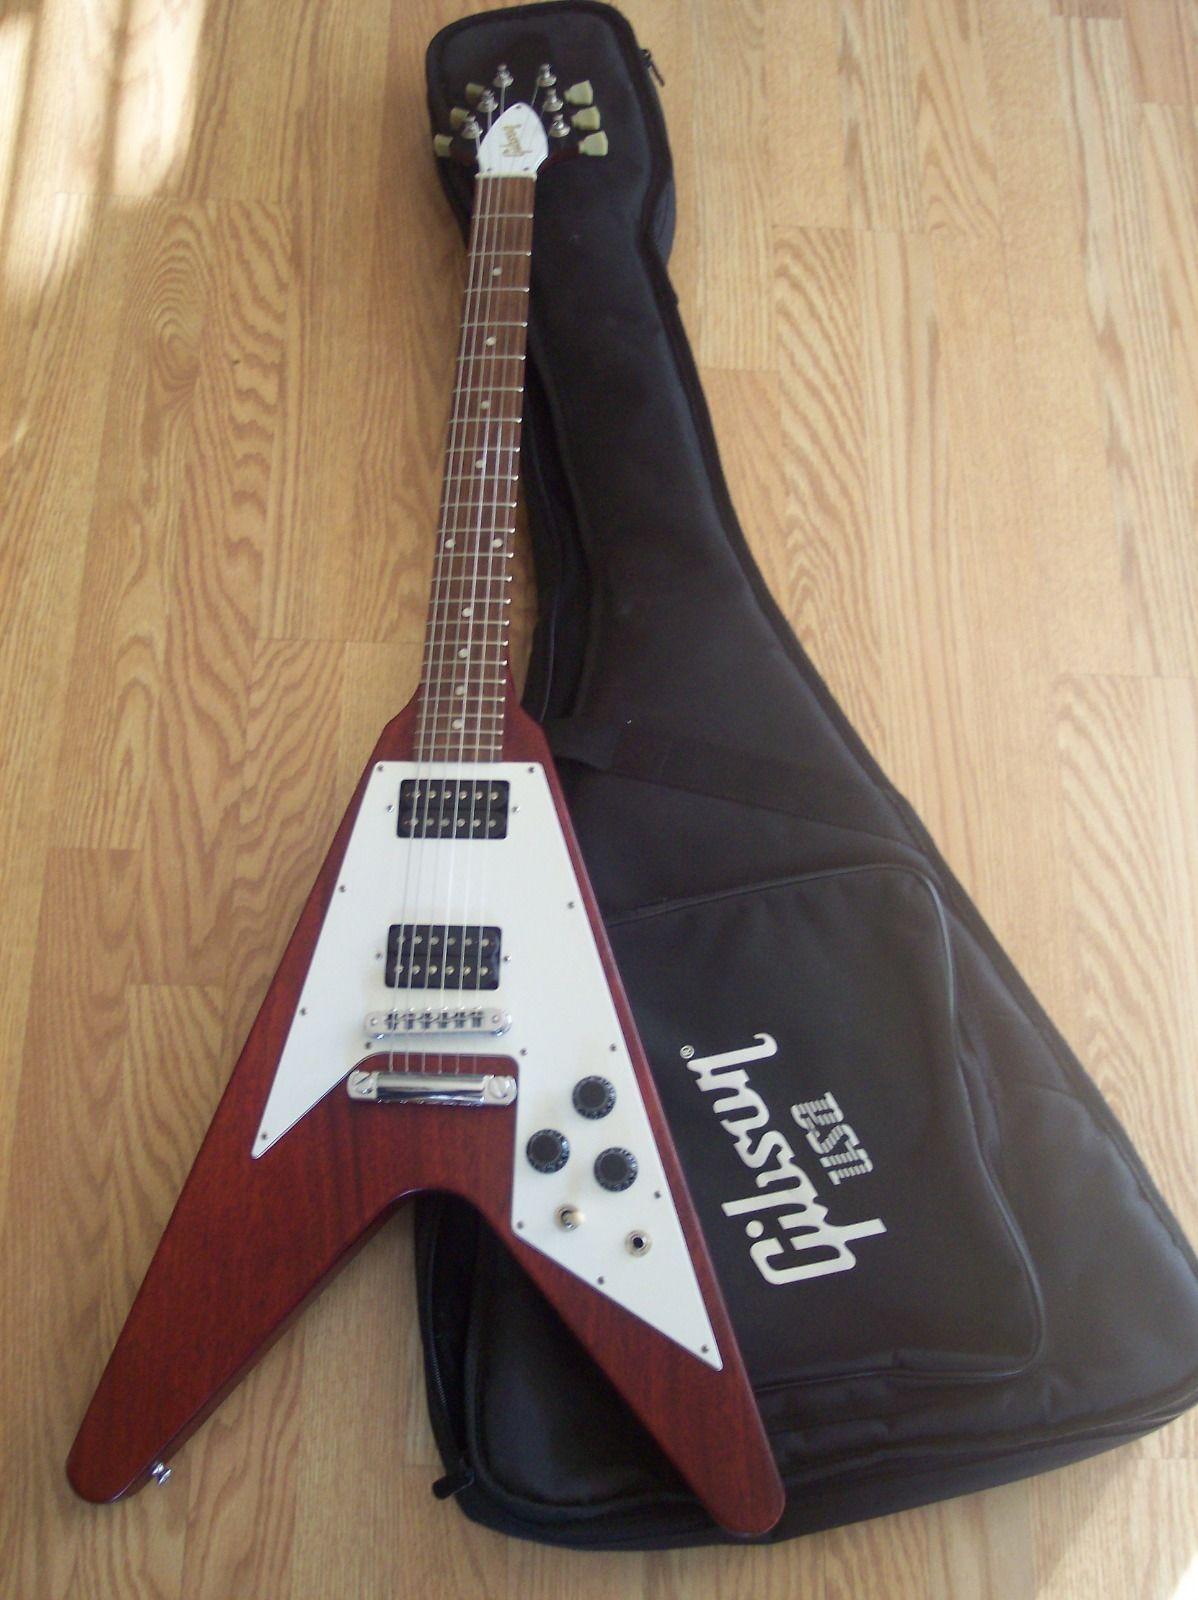 gibson usa 2007 flying v electric guitar w fender strings guitar collectibles pinterest. Black Bedroom Furniture Sets. Home Design Ideas